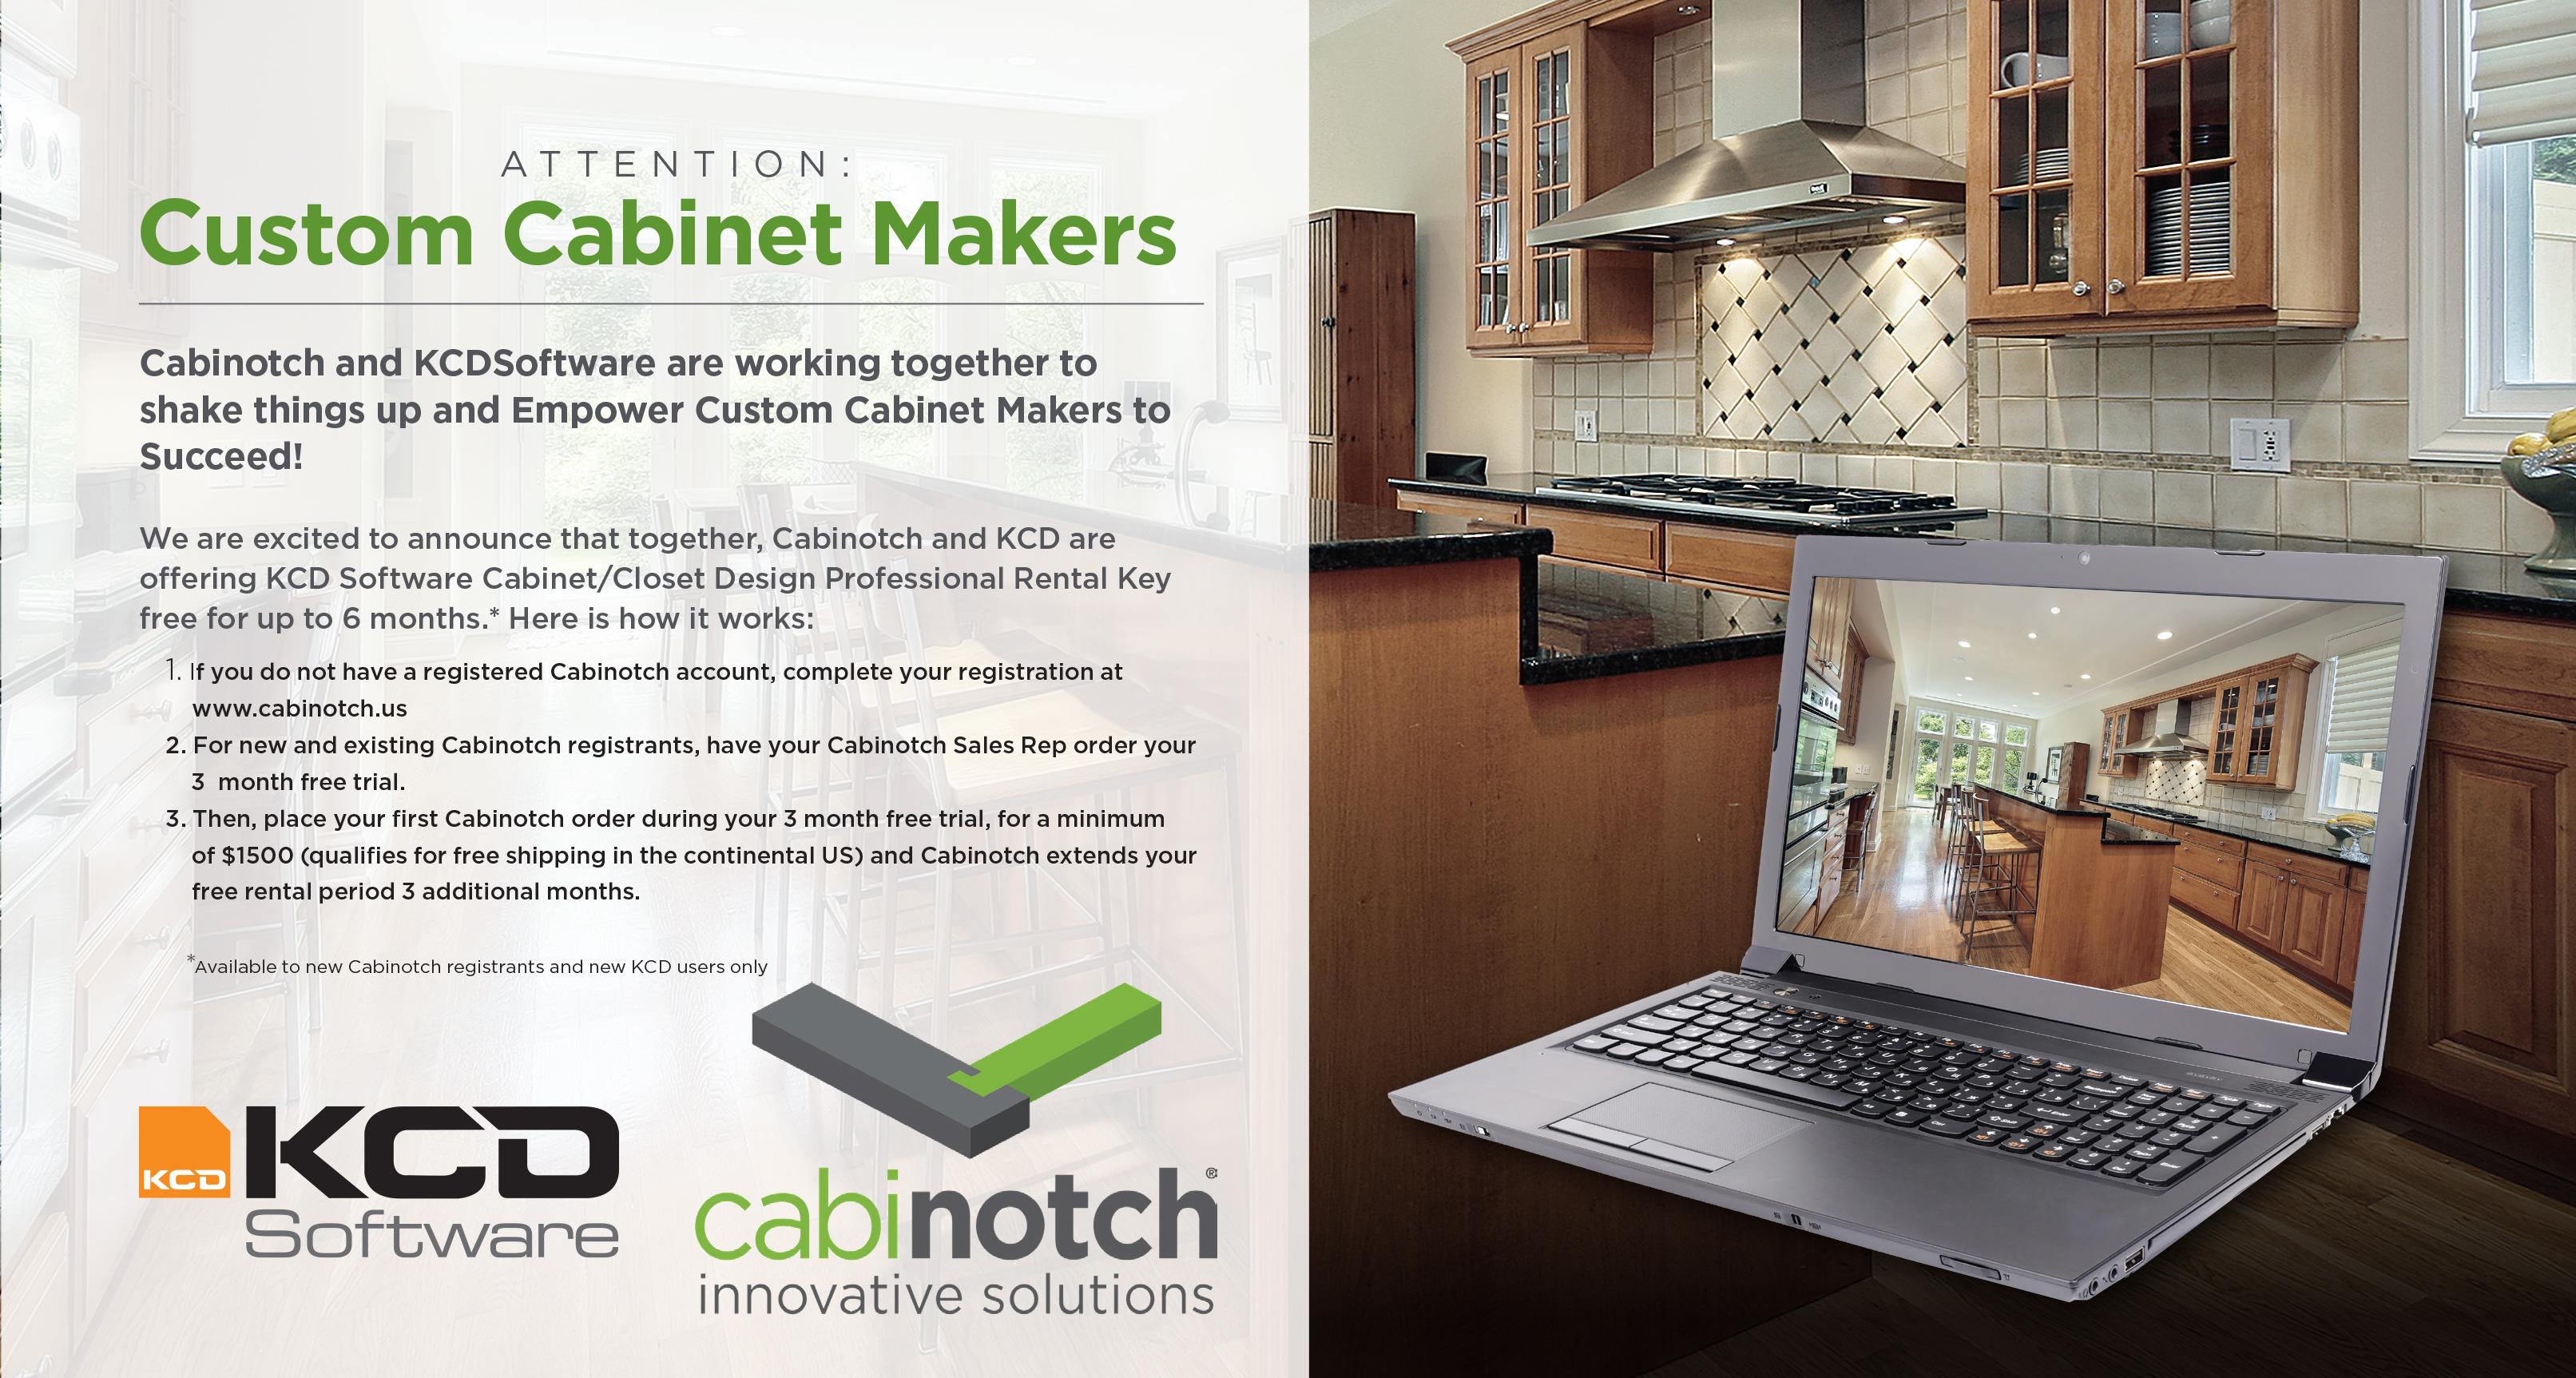 Home Cabinotch Innovative Solutions